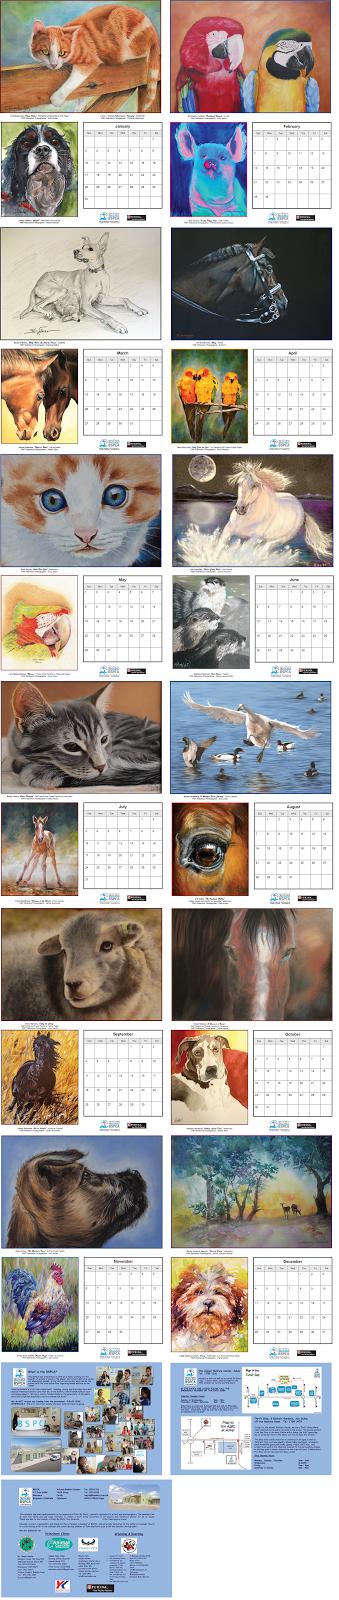 Calendar Interior